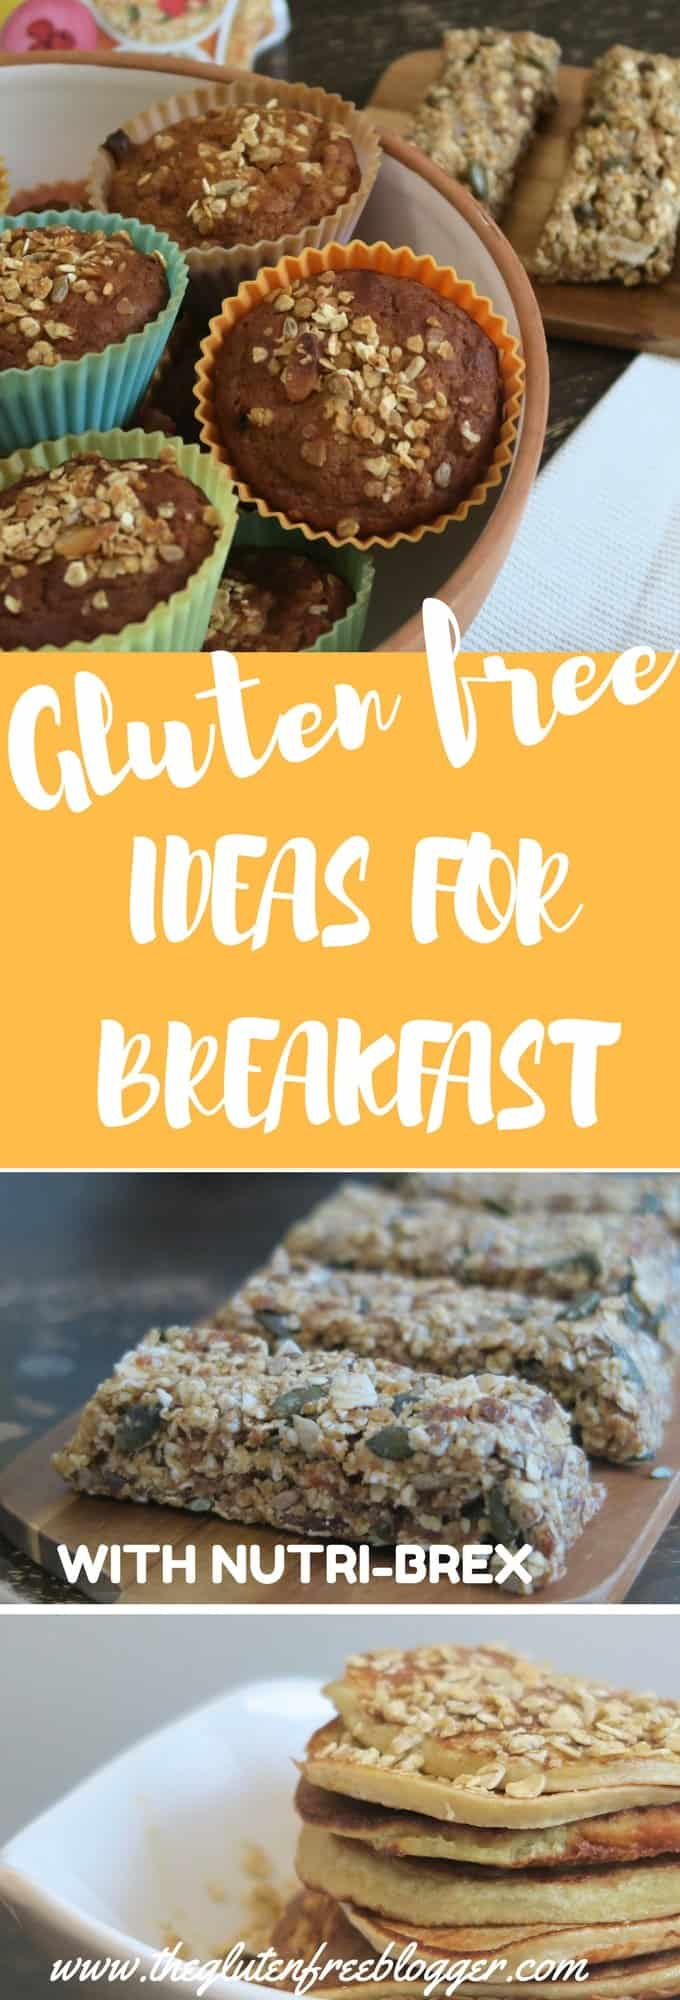 Easy gluten free breakfast ideas - breakfast muffins, protein pancakes, breakfast bars, breakfast crumbles, smoothies - www.theglutenfreeblogger.com